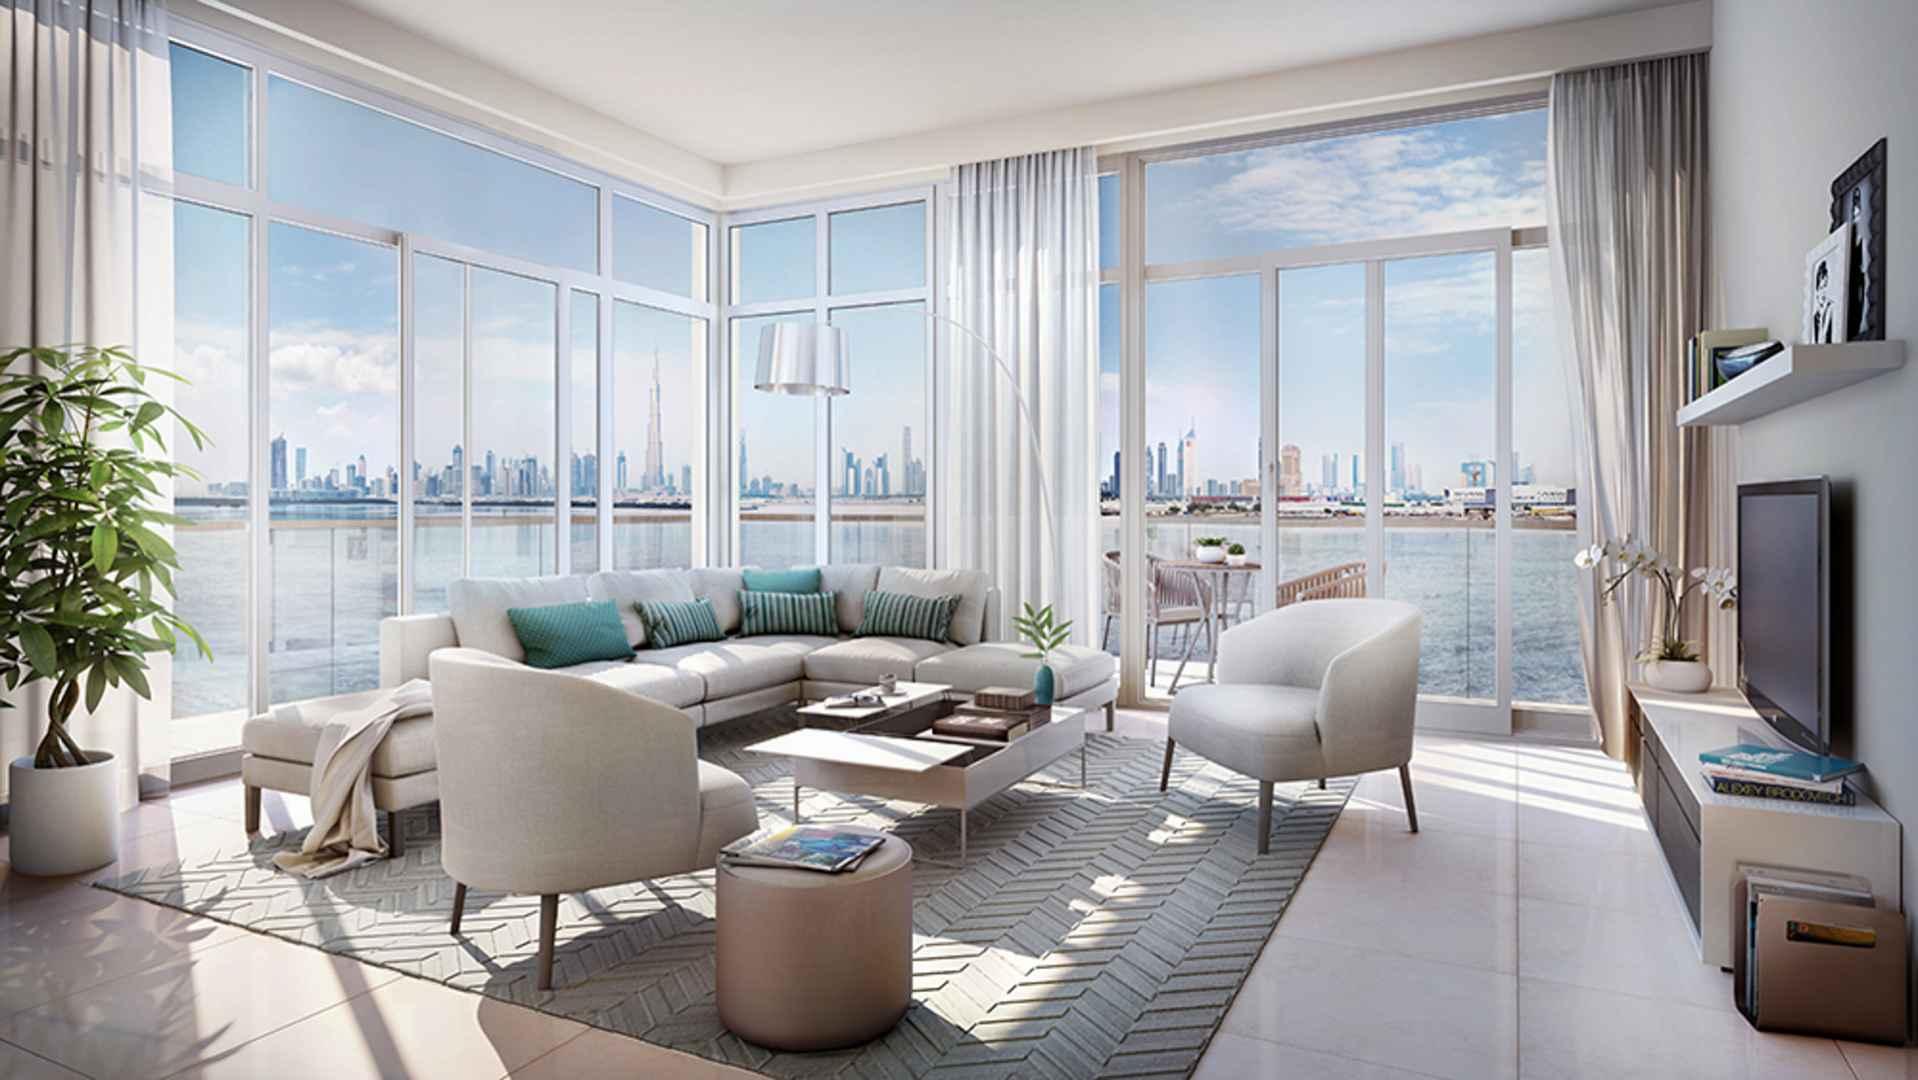 Luxury Property Dubai 3 Bedroom Apartment for sale in The Cove Dubai Creek Harbour